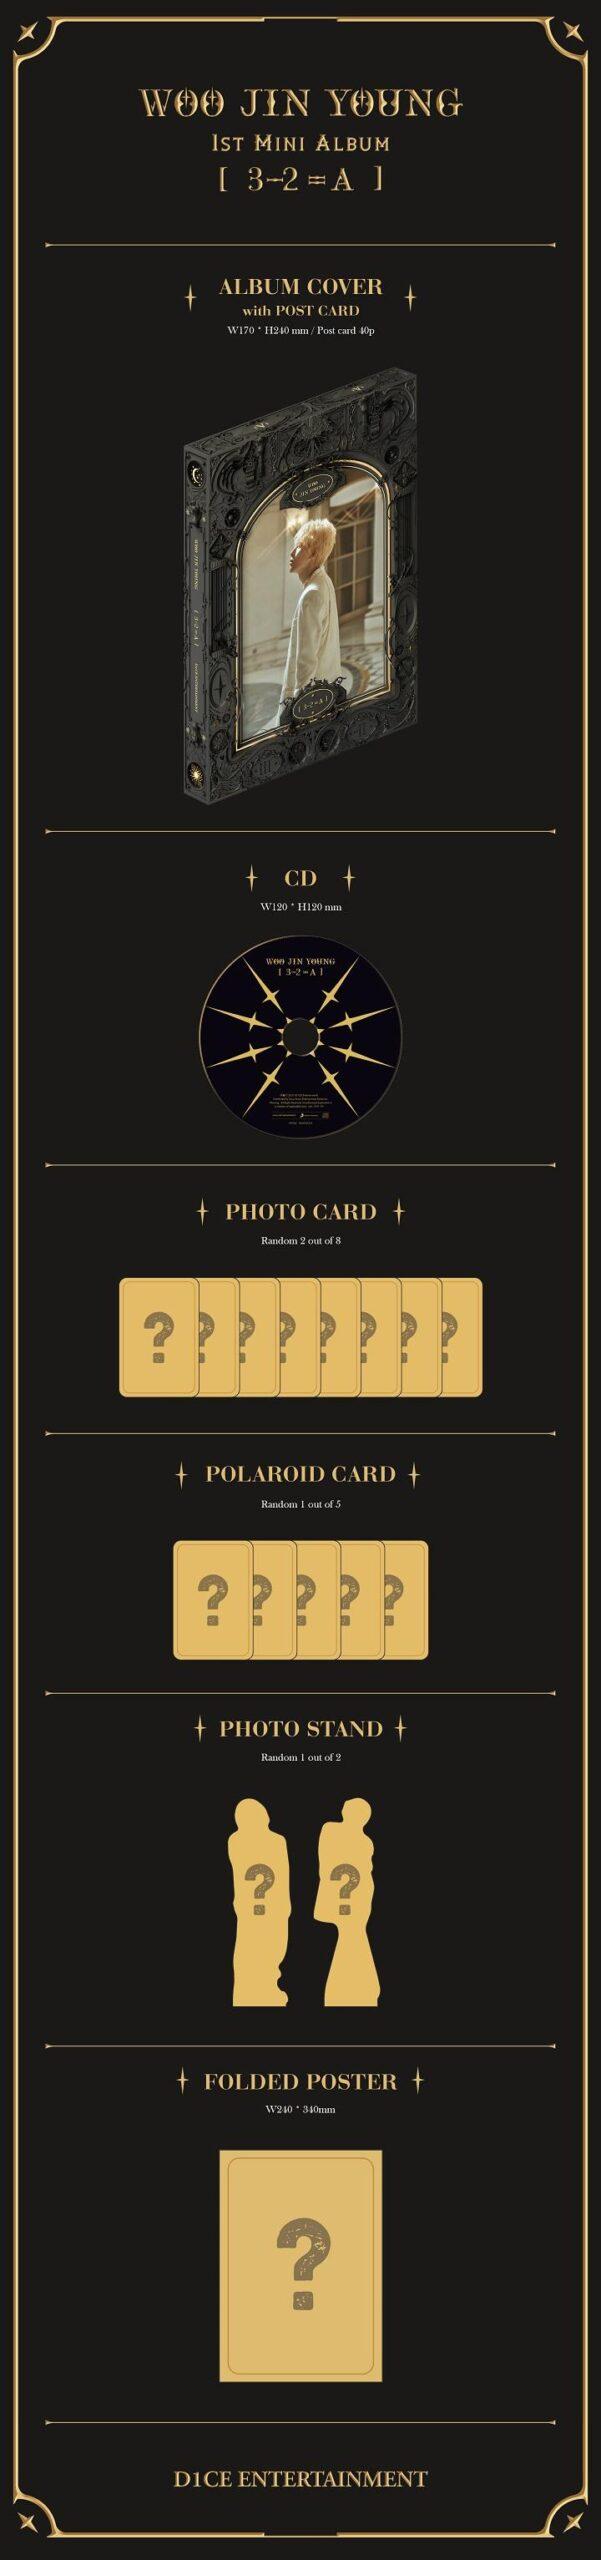 1st Mini 3 2A de WOO JIN YOUNG Miembro de D1CE